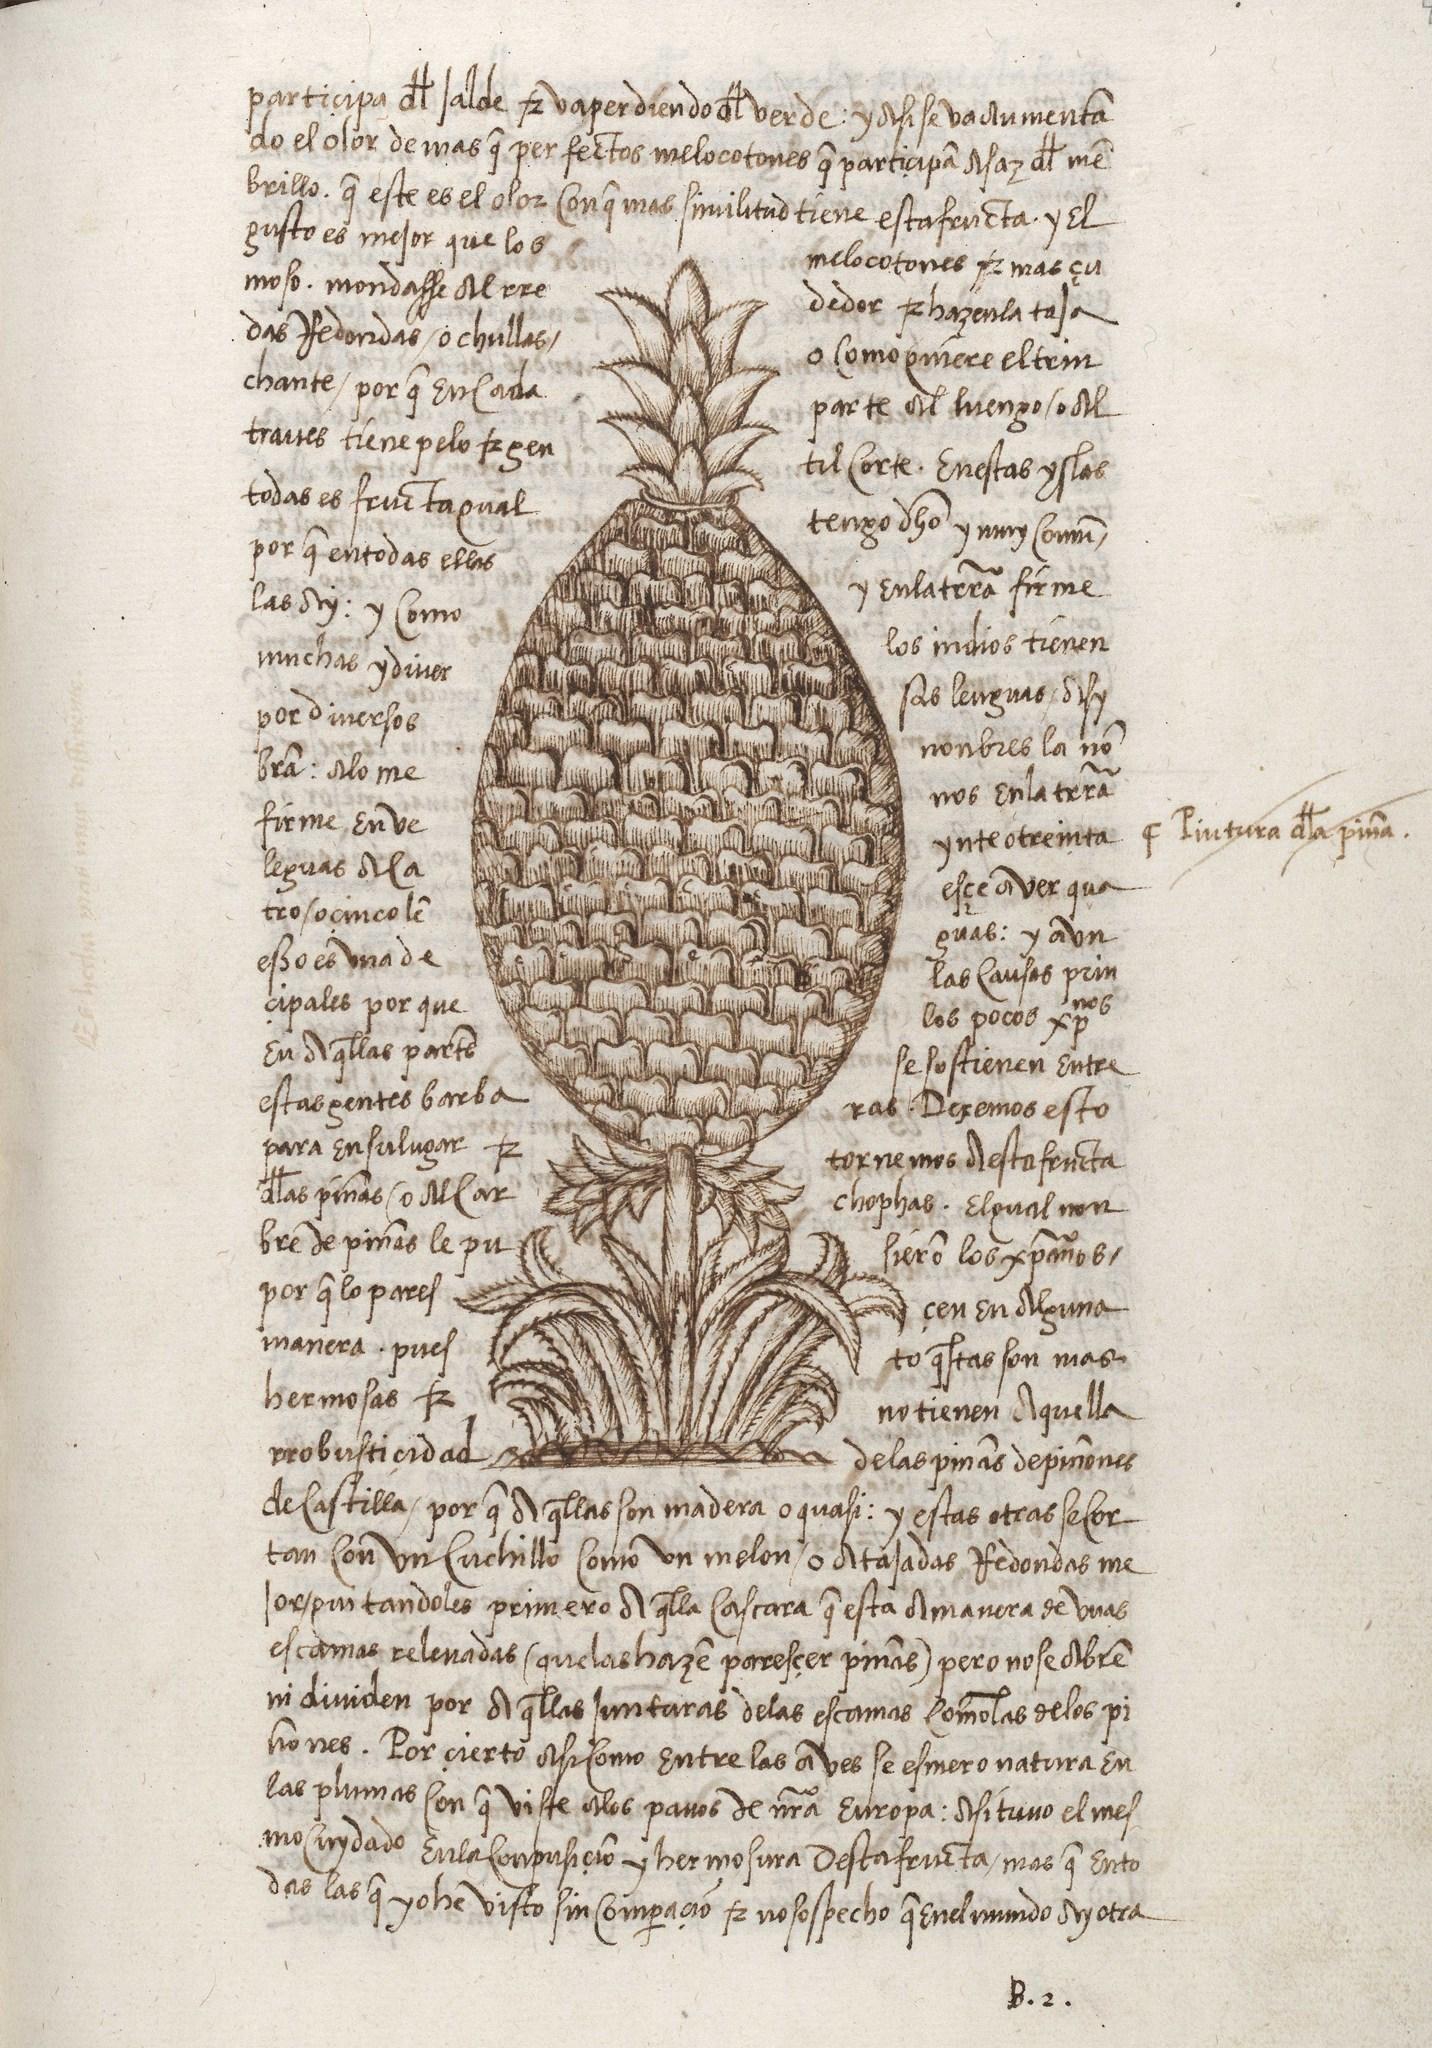 Gonzalo Fernández de Oviedo y Valdés pineapple